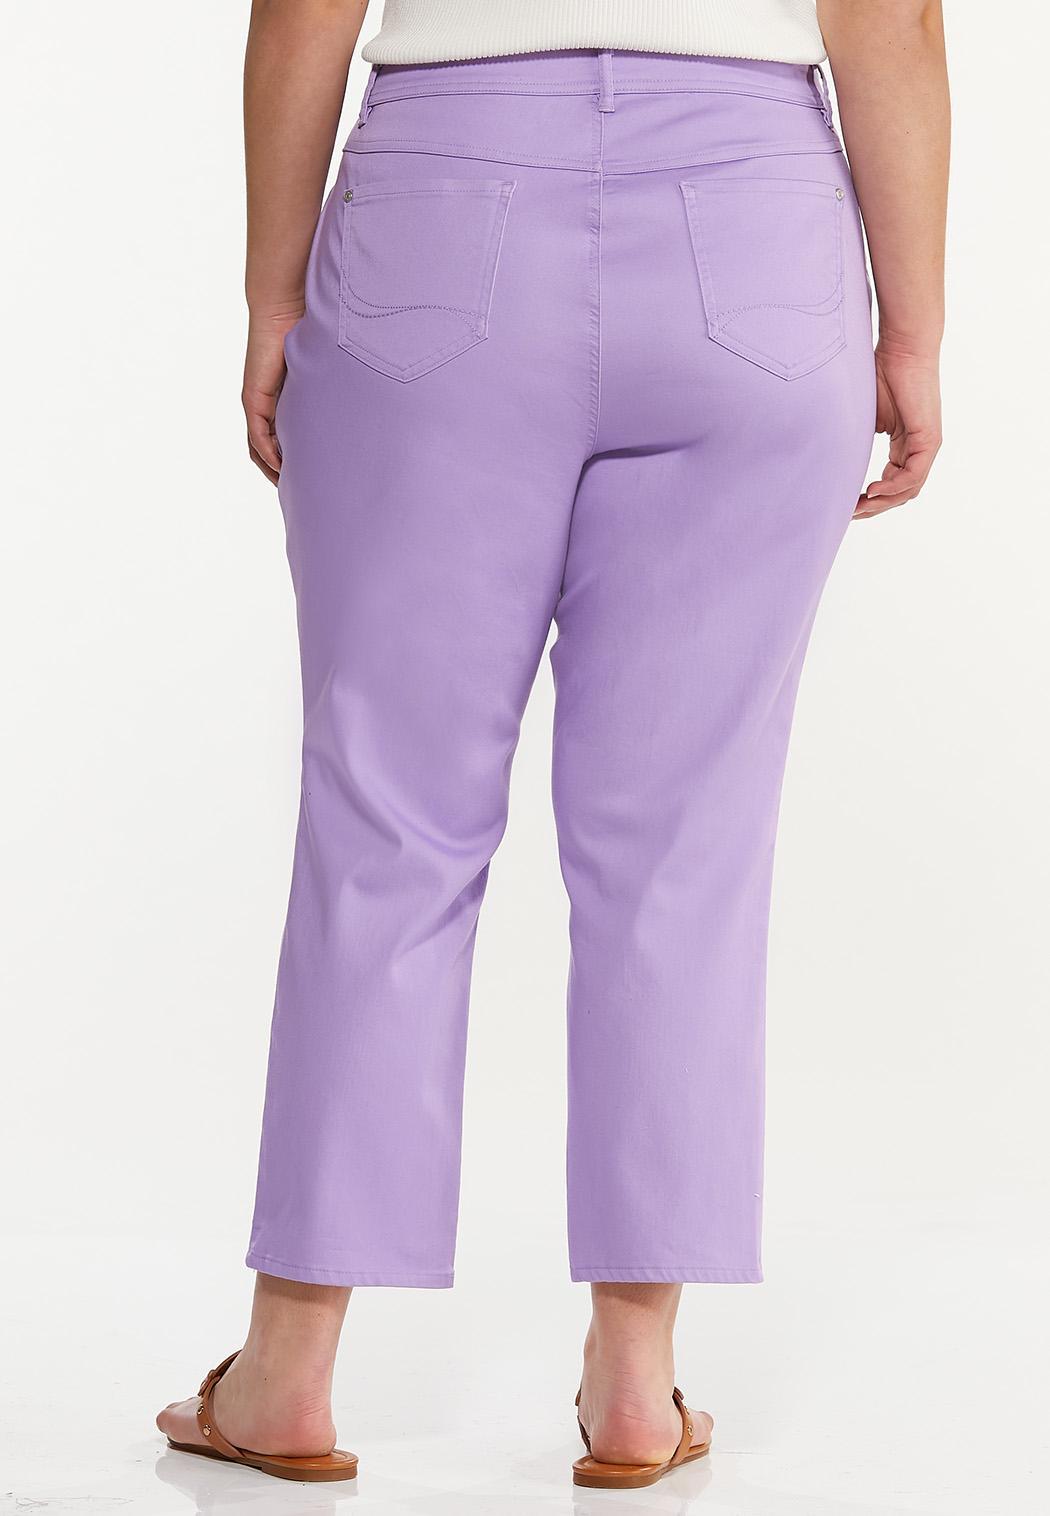 Plus Size Cropped Lavender Skinny Jeans (Item #44560445)